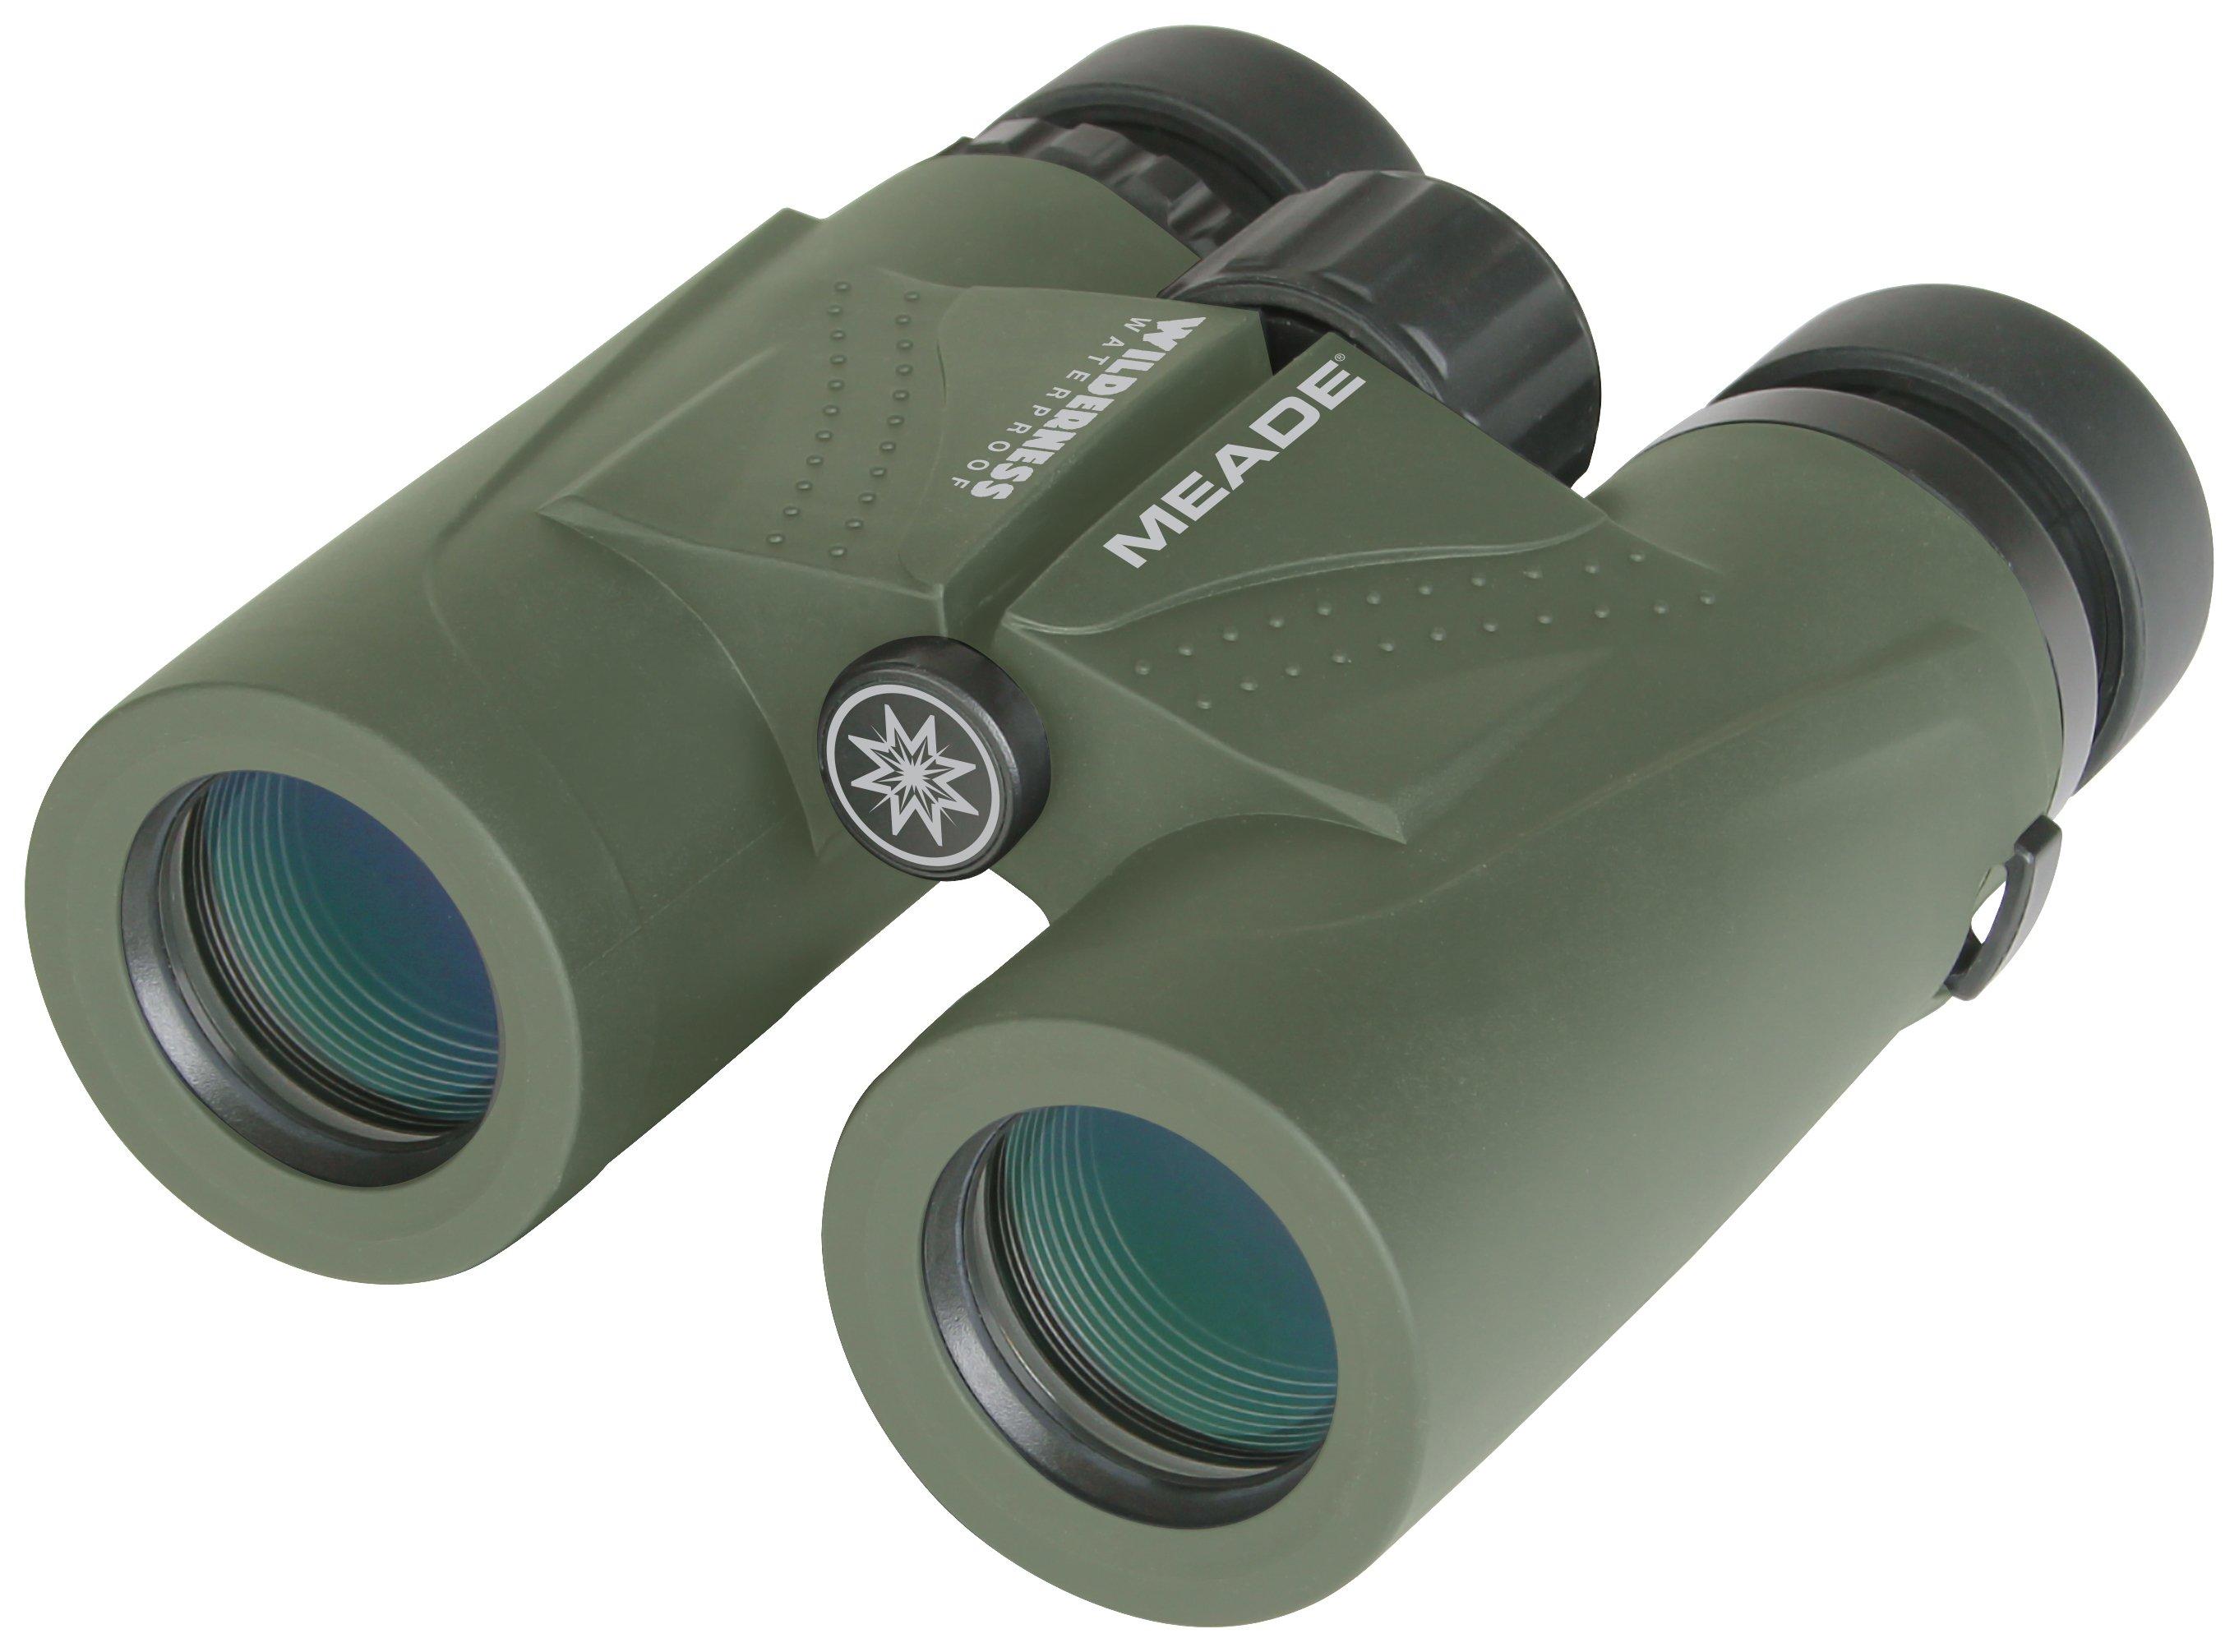 Meade Wilderness Binoculars 10x32.